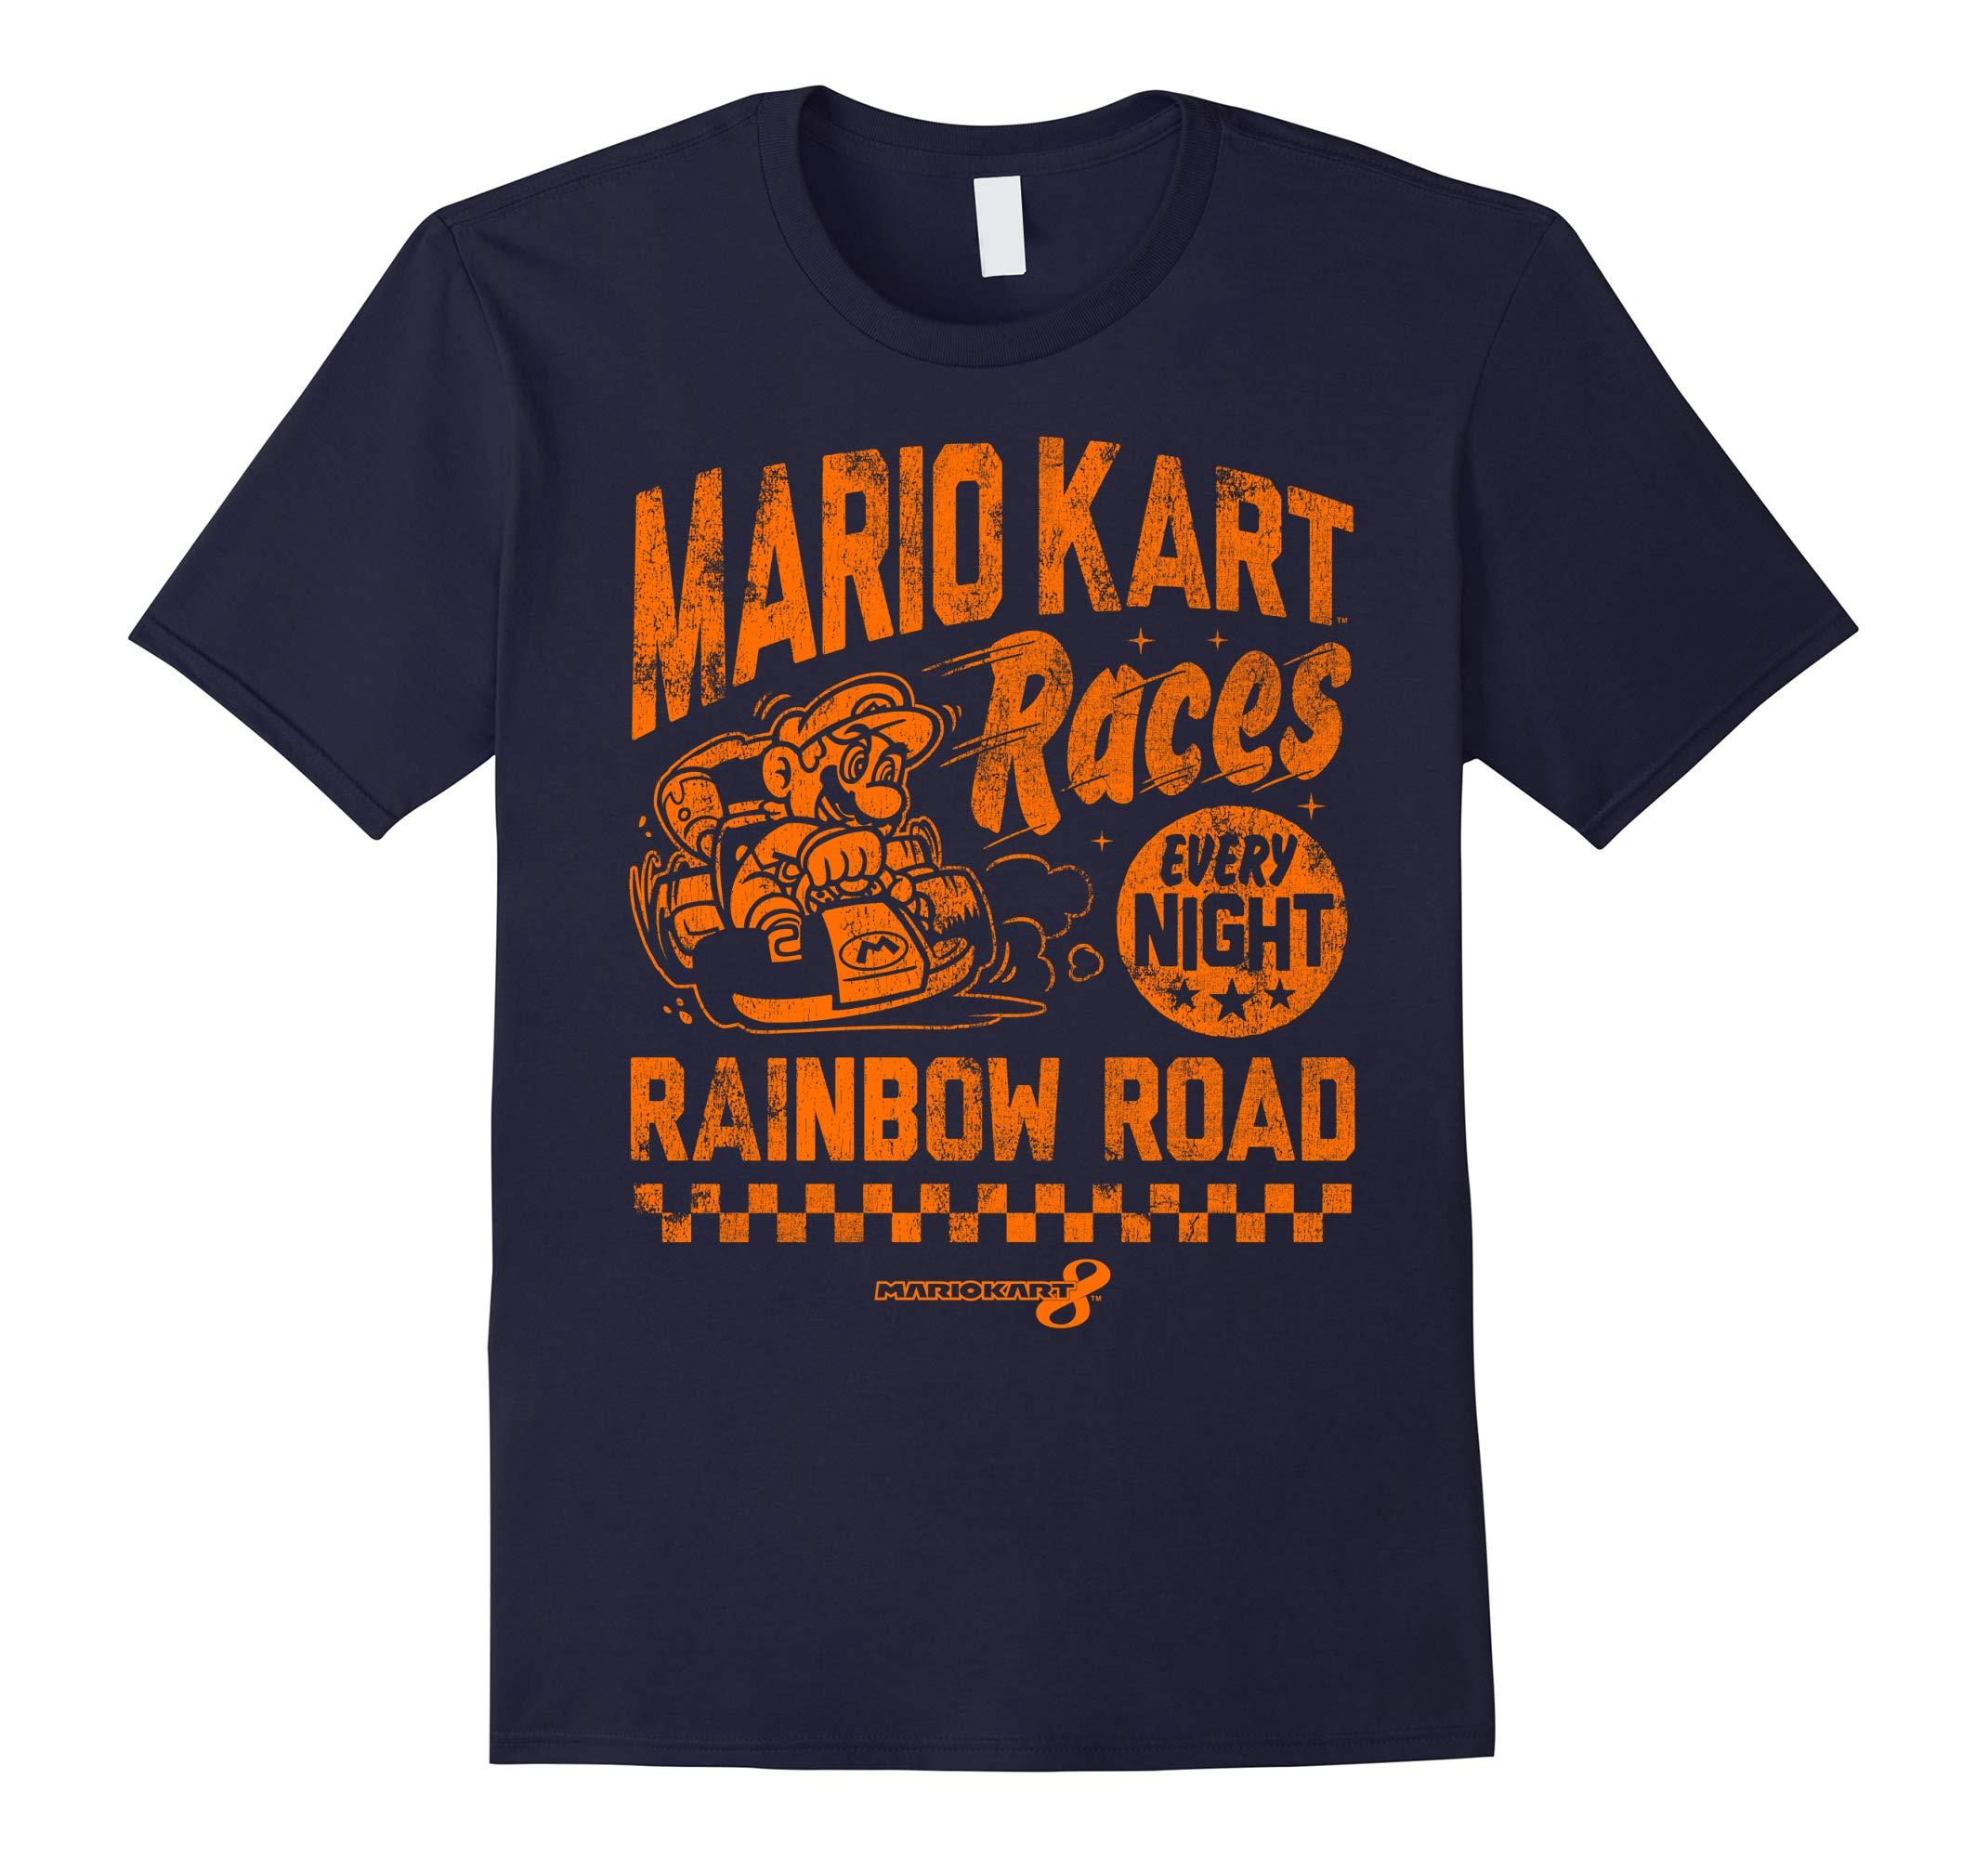 Nintendo Mario Kart Rainbow Road Vintage Graphic T-Shirt-RT